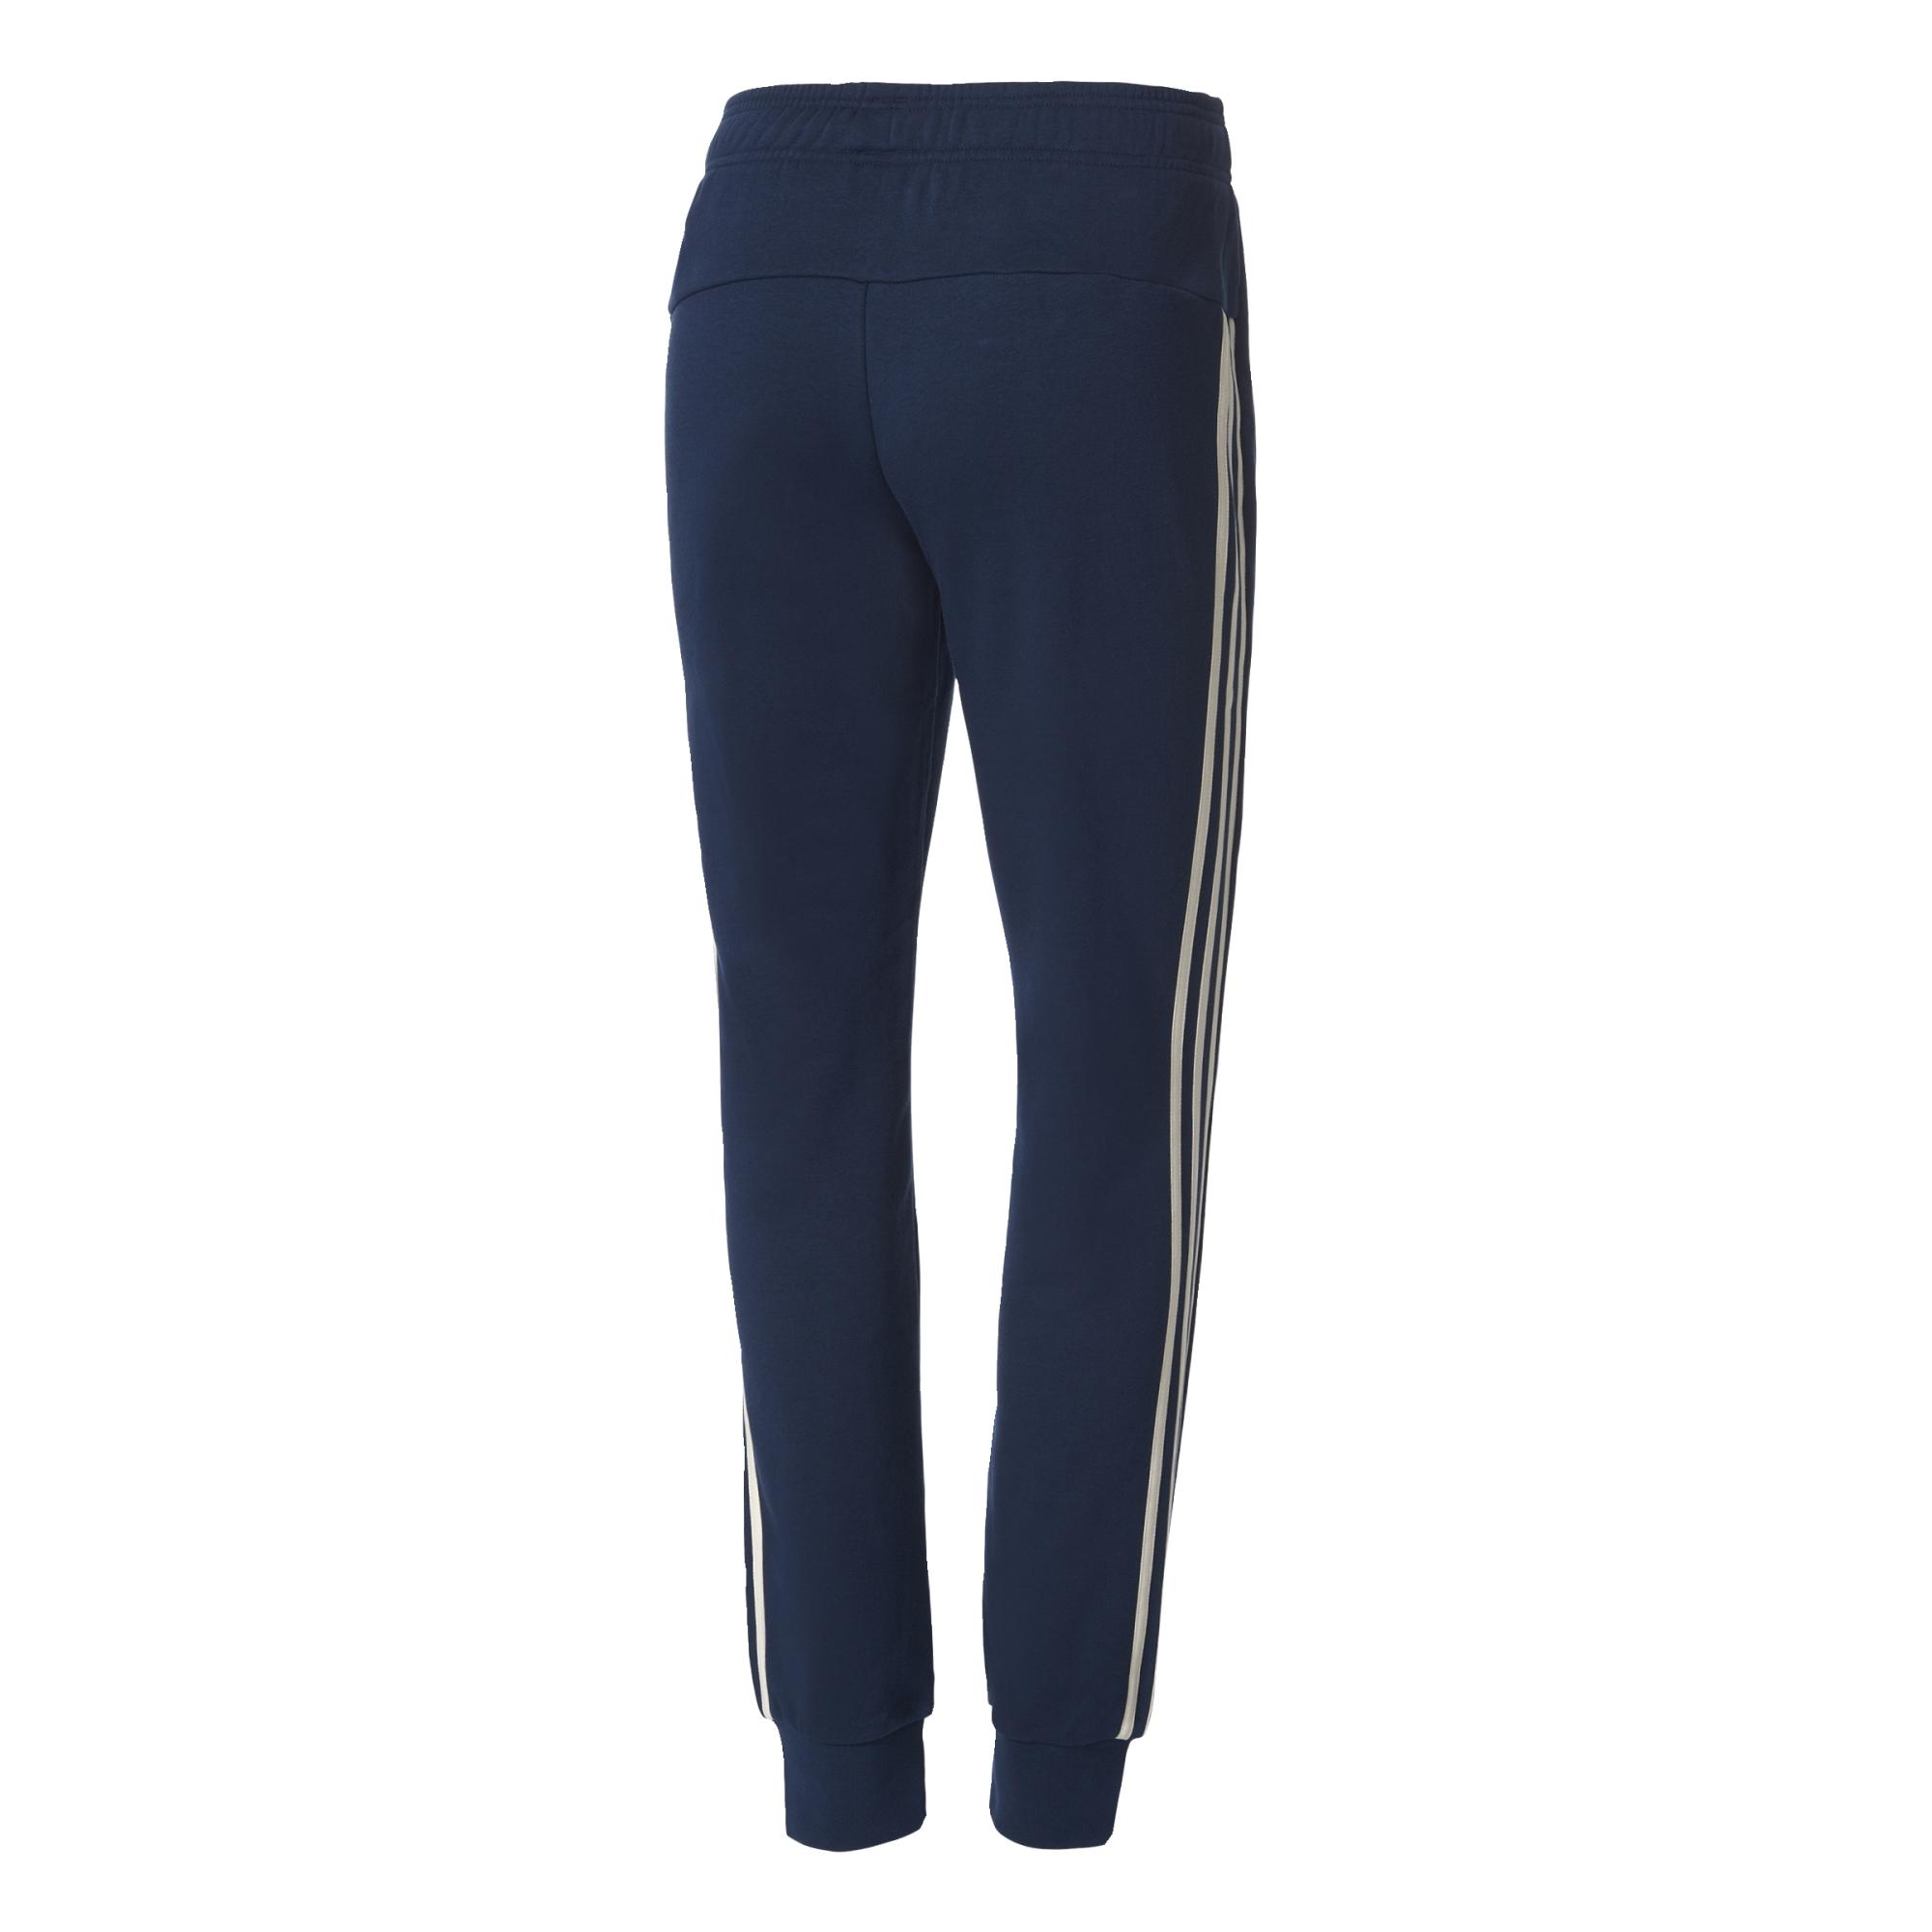 spodnie adidas Essentials 3 Stripes Pant Cuffed S97112